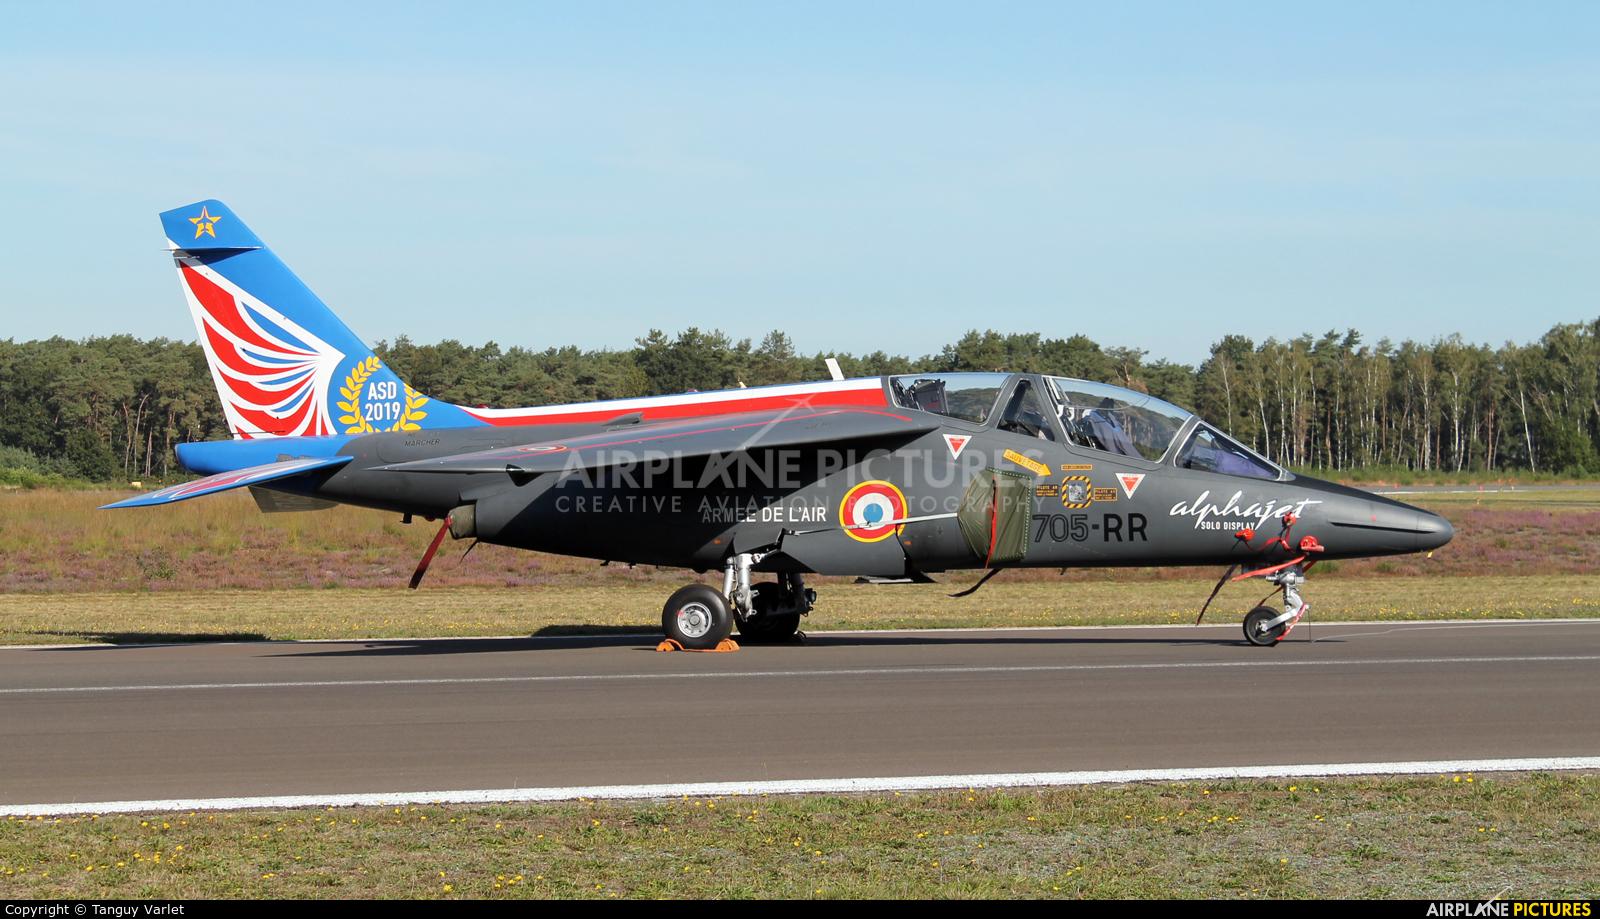 France - Air Force 705-RR aircraft at Kleine Brogel